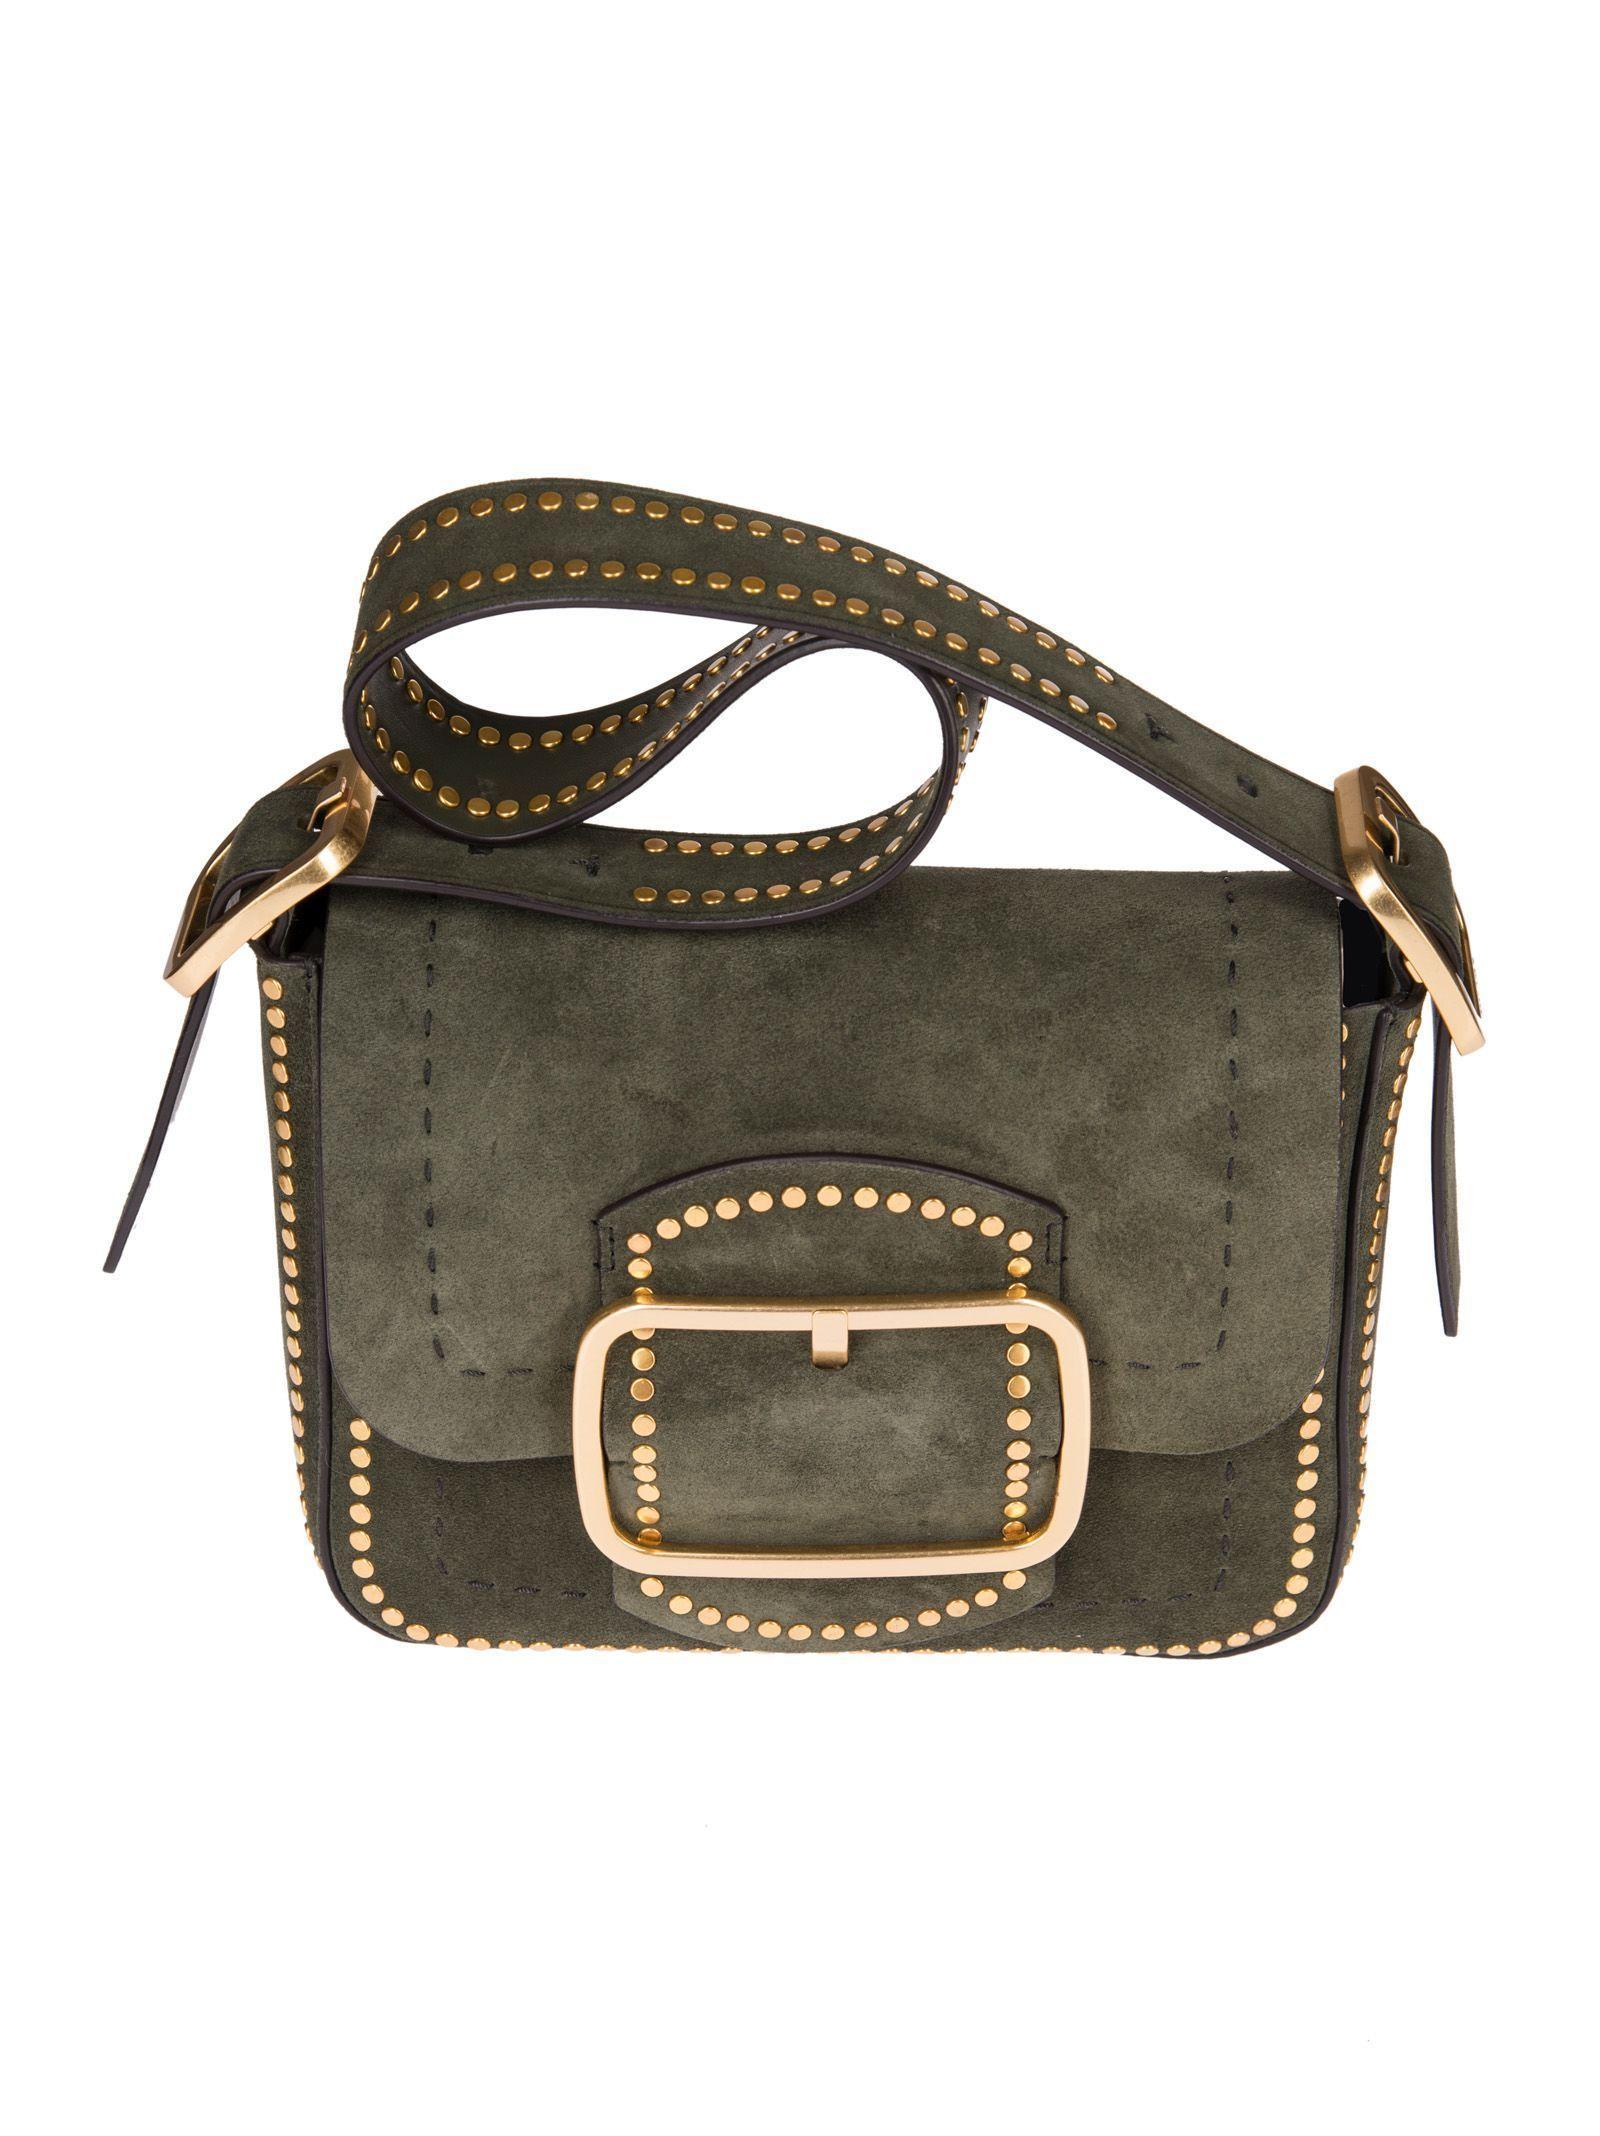 d286b48a17f TORY BURCH SAWYER SHOULDER BAG.  toryburch  bags  shoulder bags ...